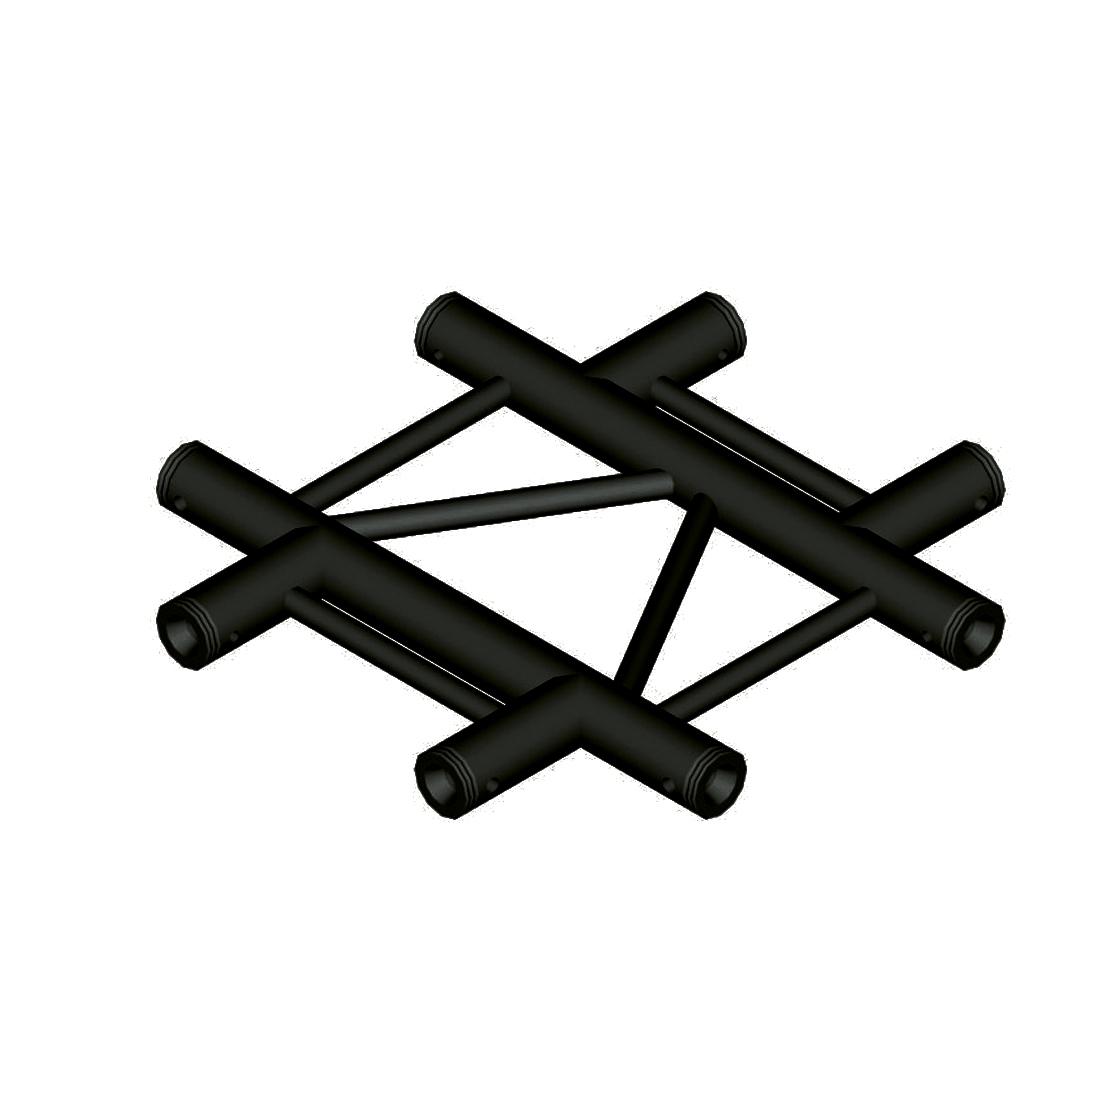 DT 32/2-C41HX black